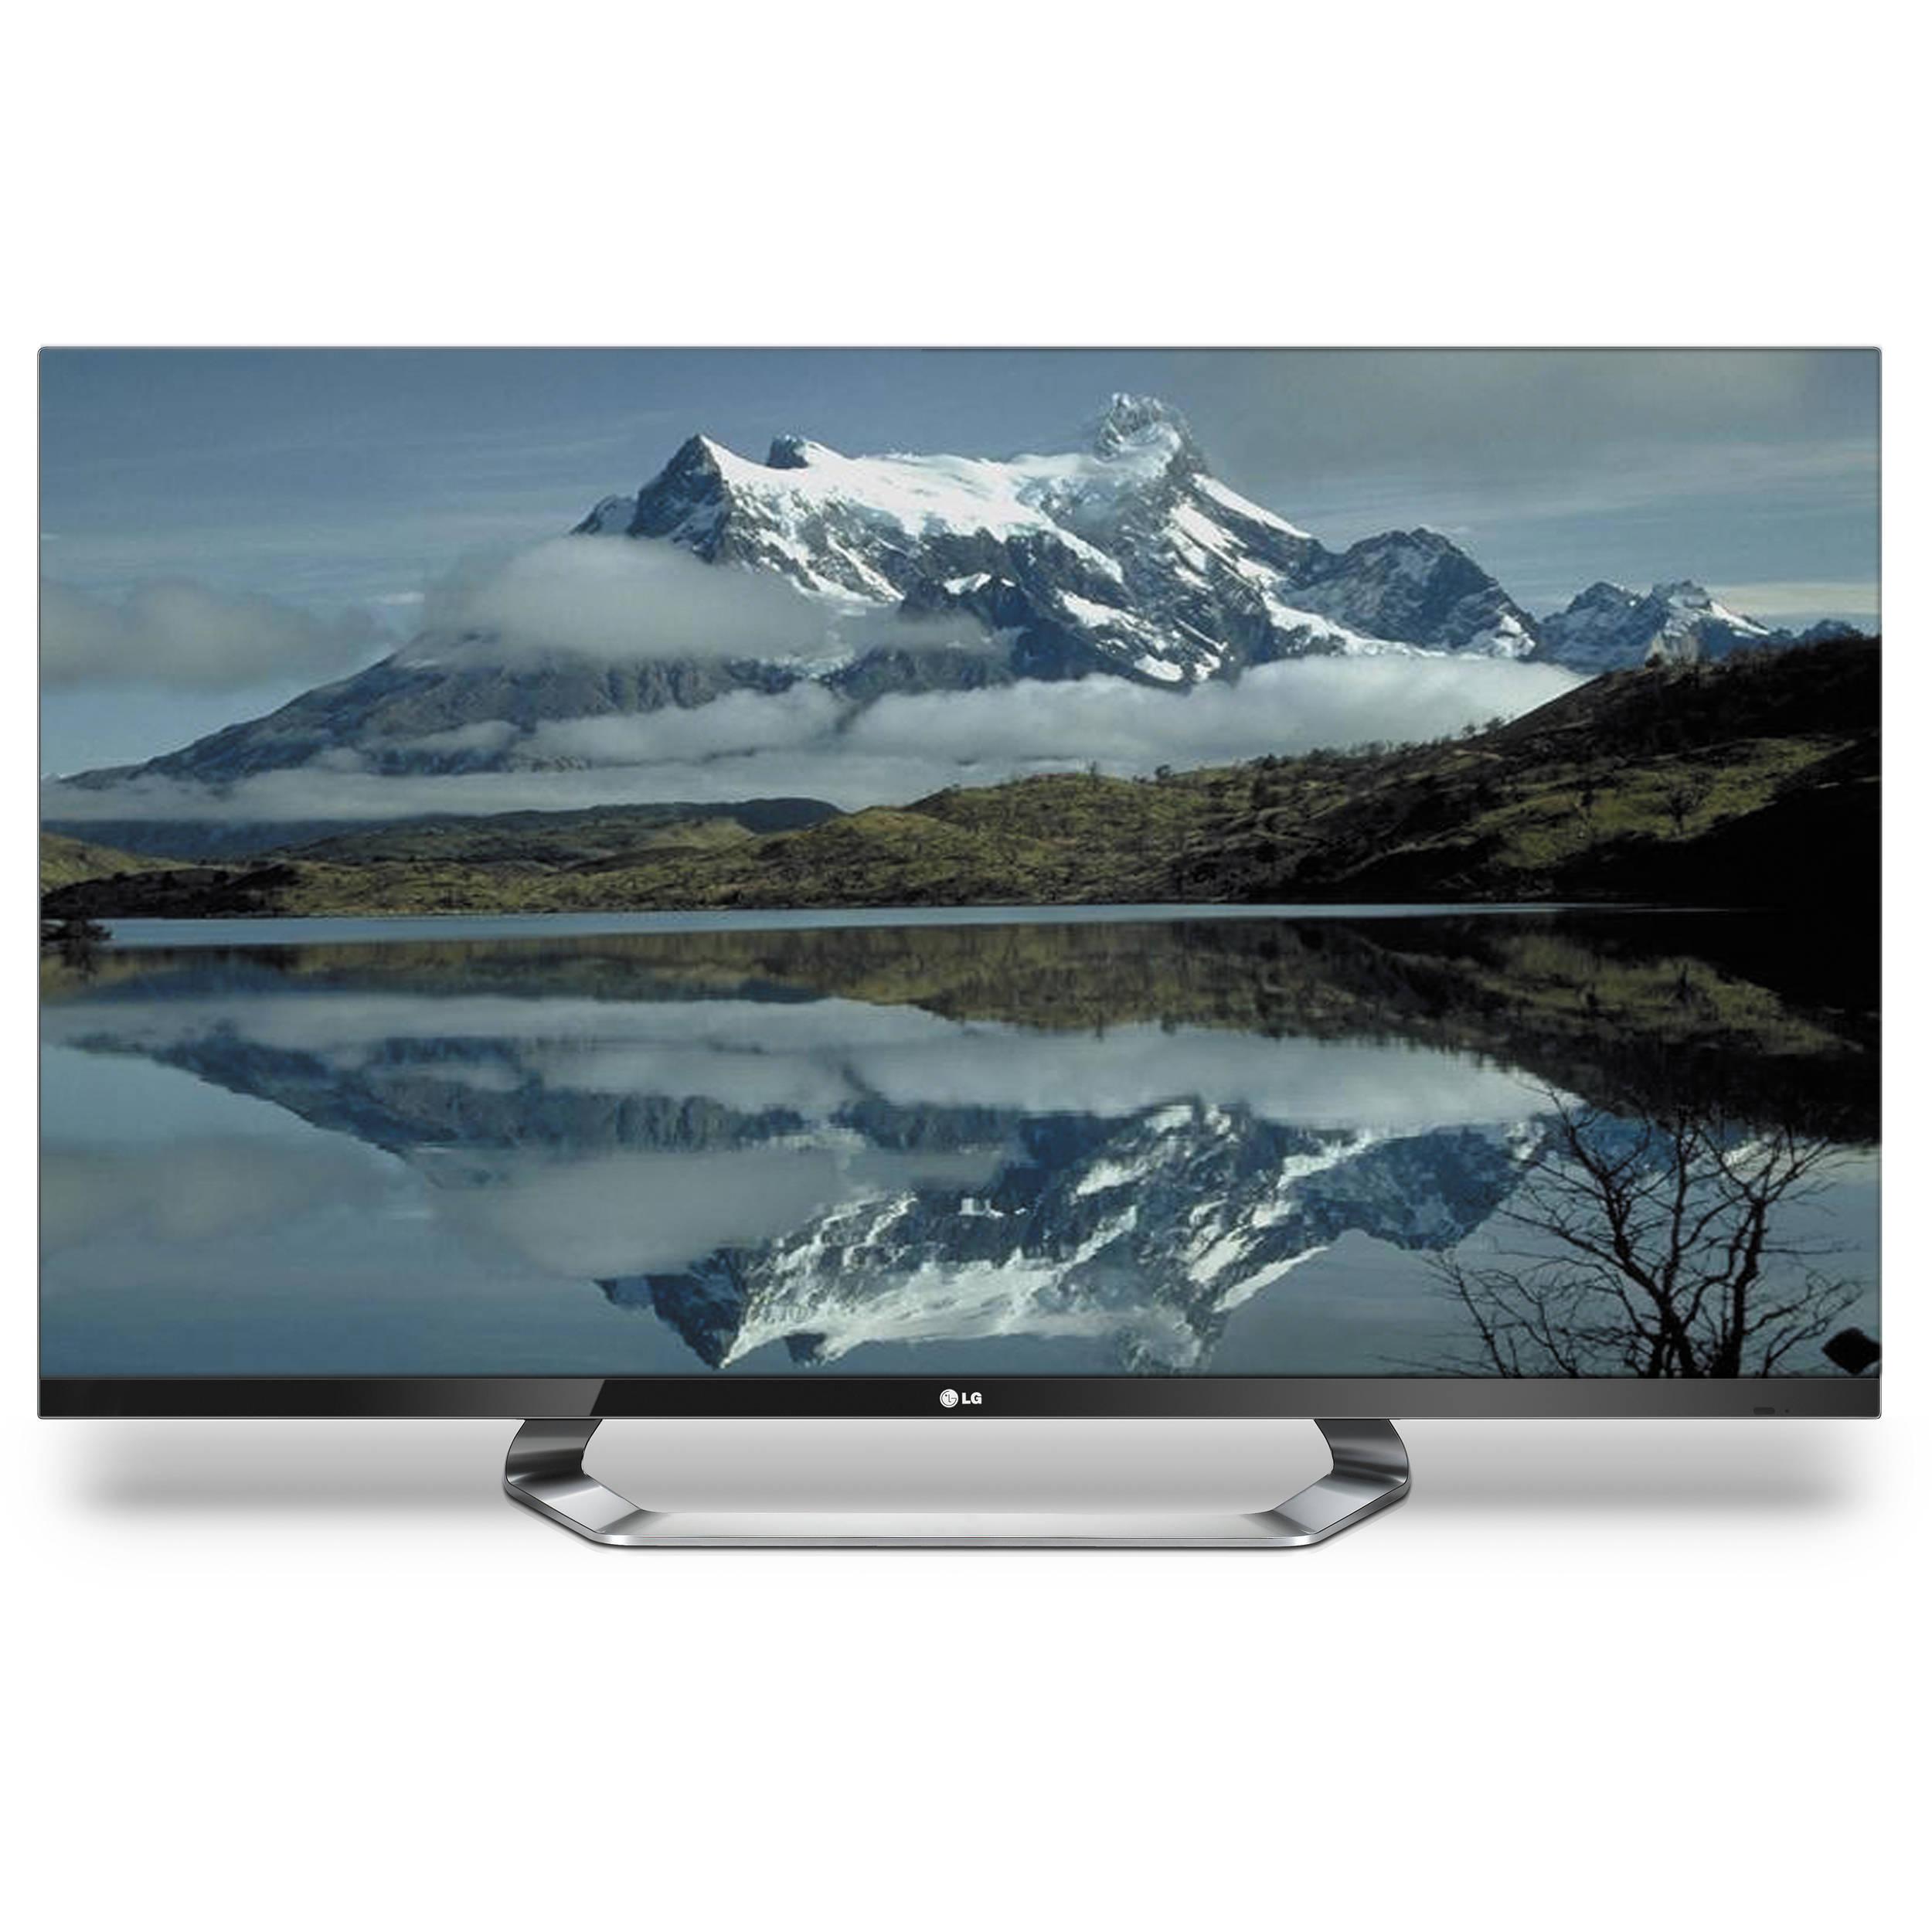 LG 55LM7600 TV Windows 8 Driver Download